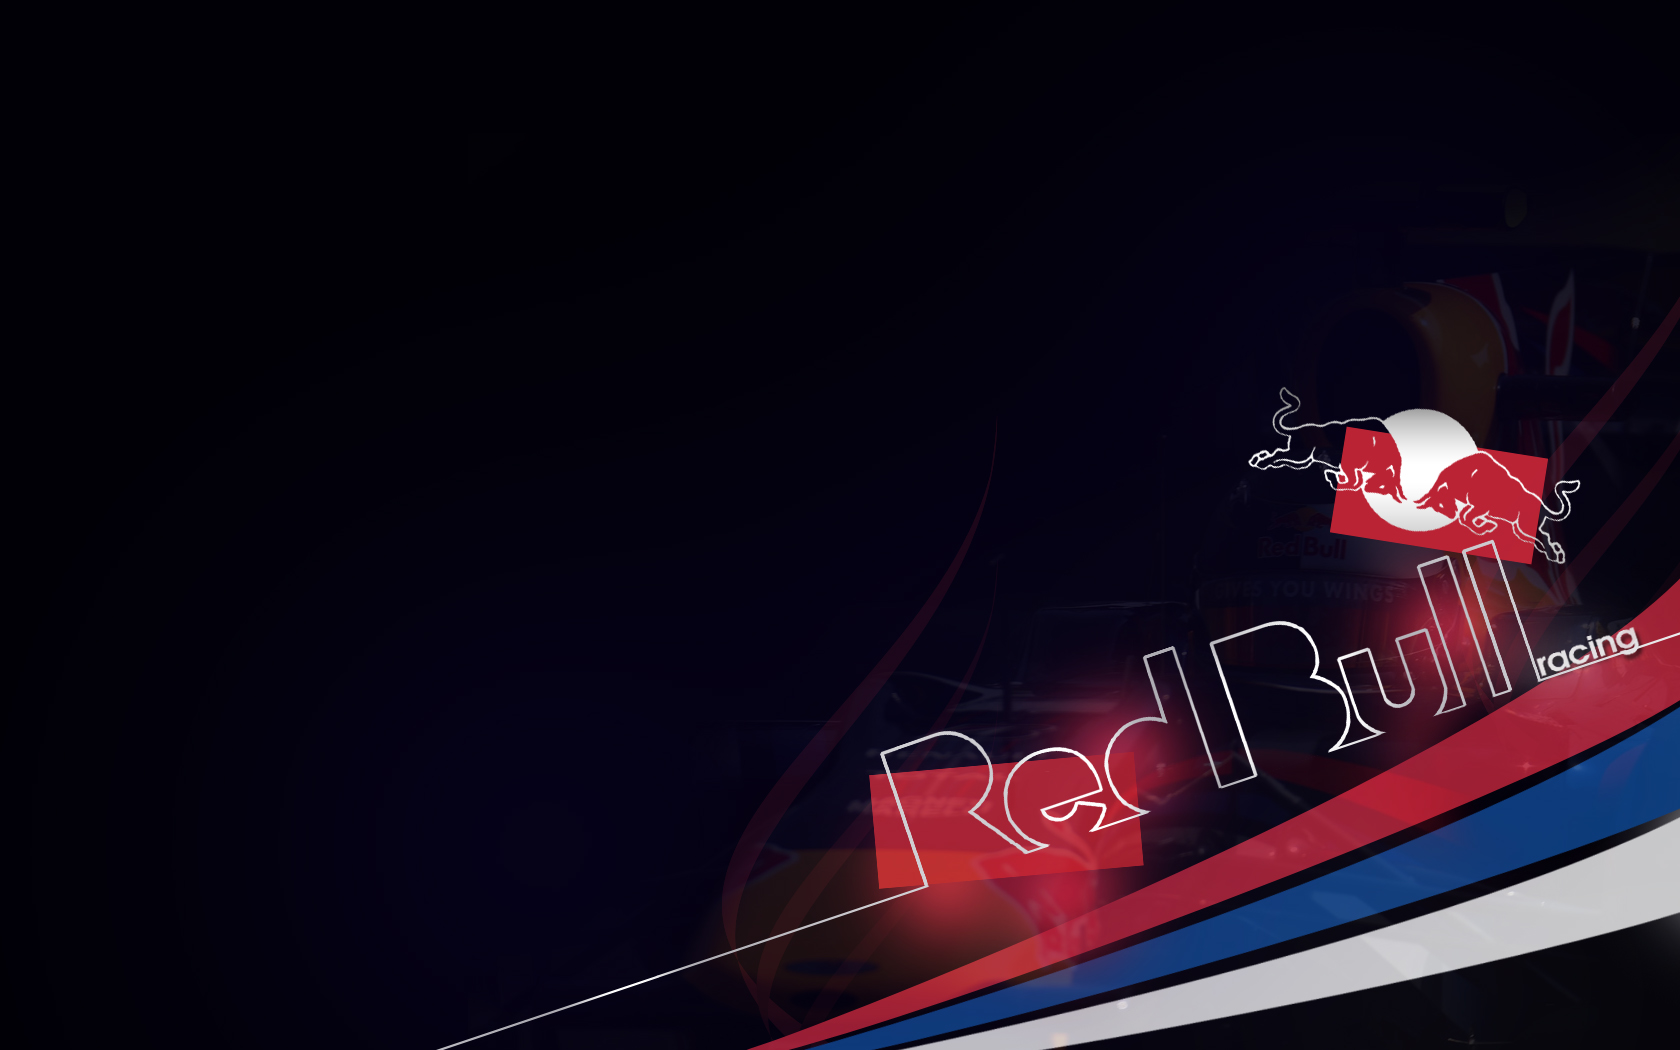 77 Red Bull Backgrounds On Wallpapersafari: Redbull Wallpapers